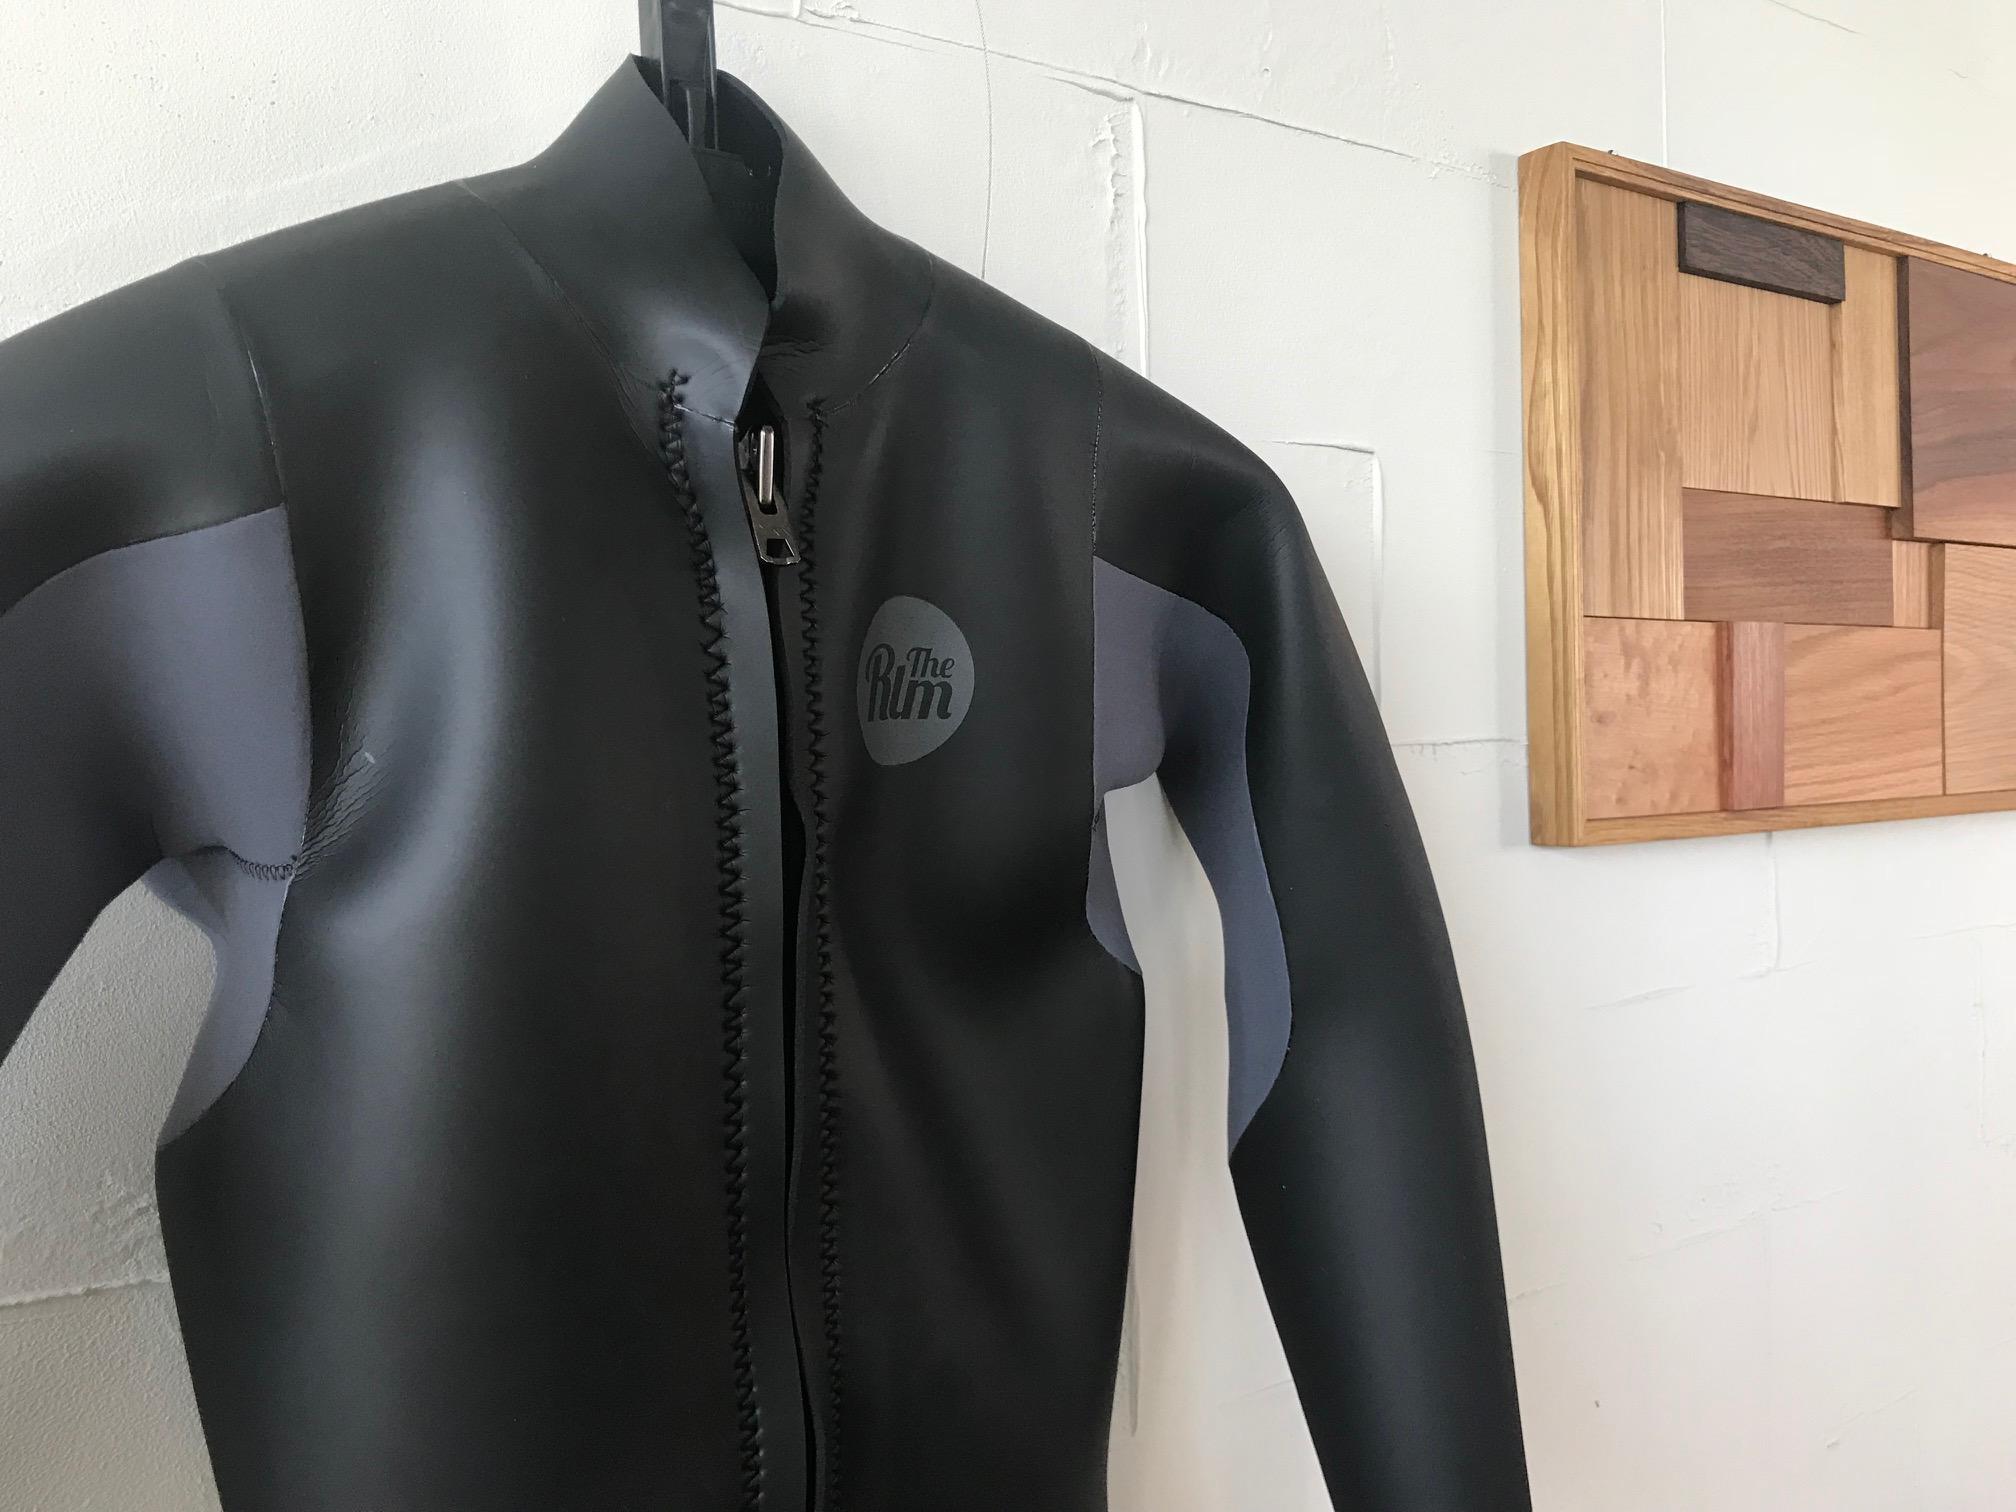 L/S Jacket & Long John // RLM WETSUITS